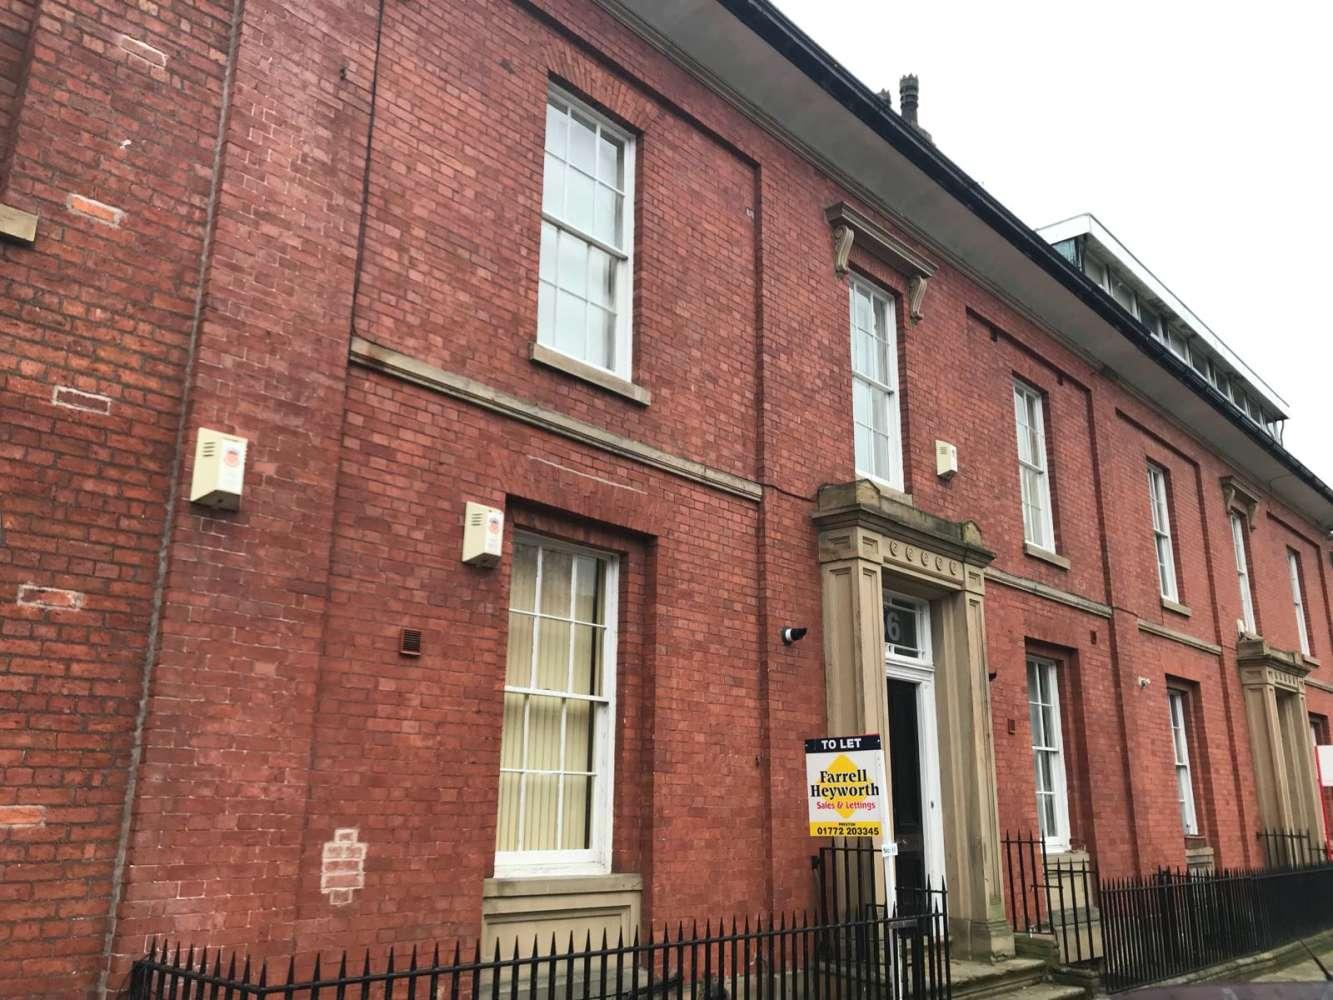 Residential use Preston, PR1 8HU - Flats 1-11 - 0009